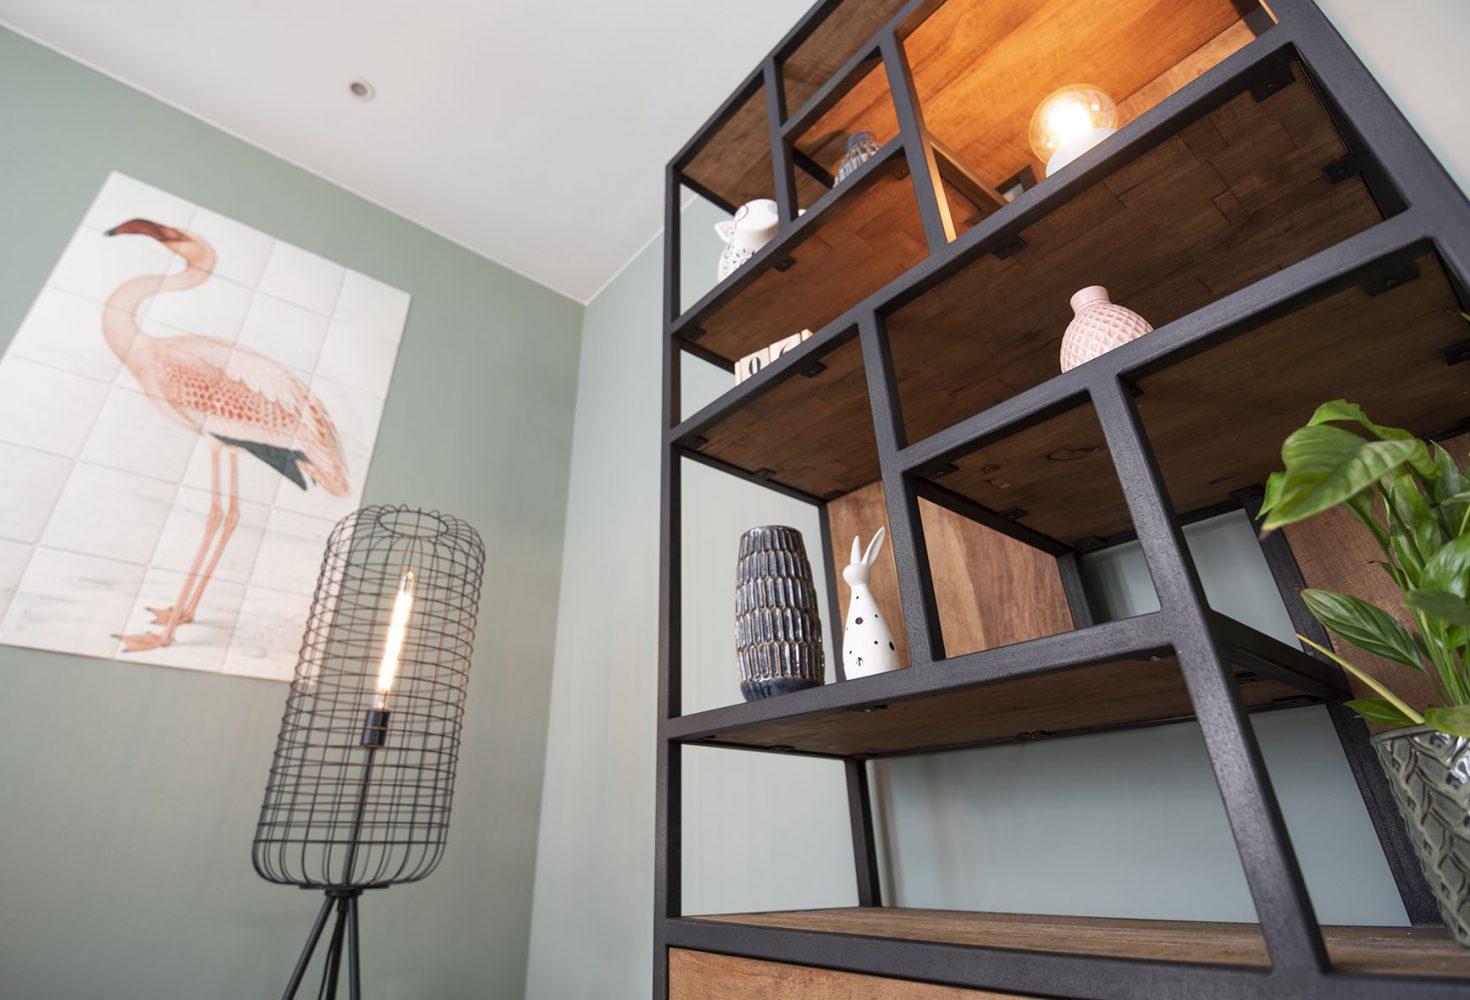 Huiskamer interieur advies Drunen styling binnenhuisarchitect kast sfeer